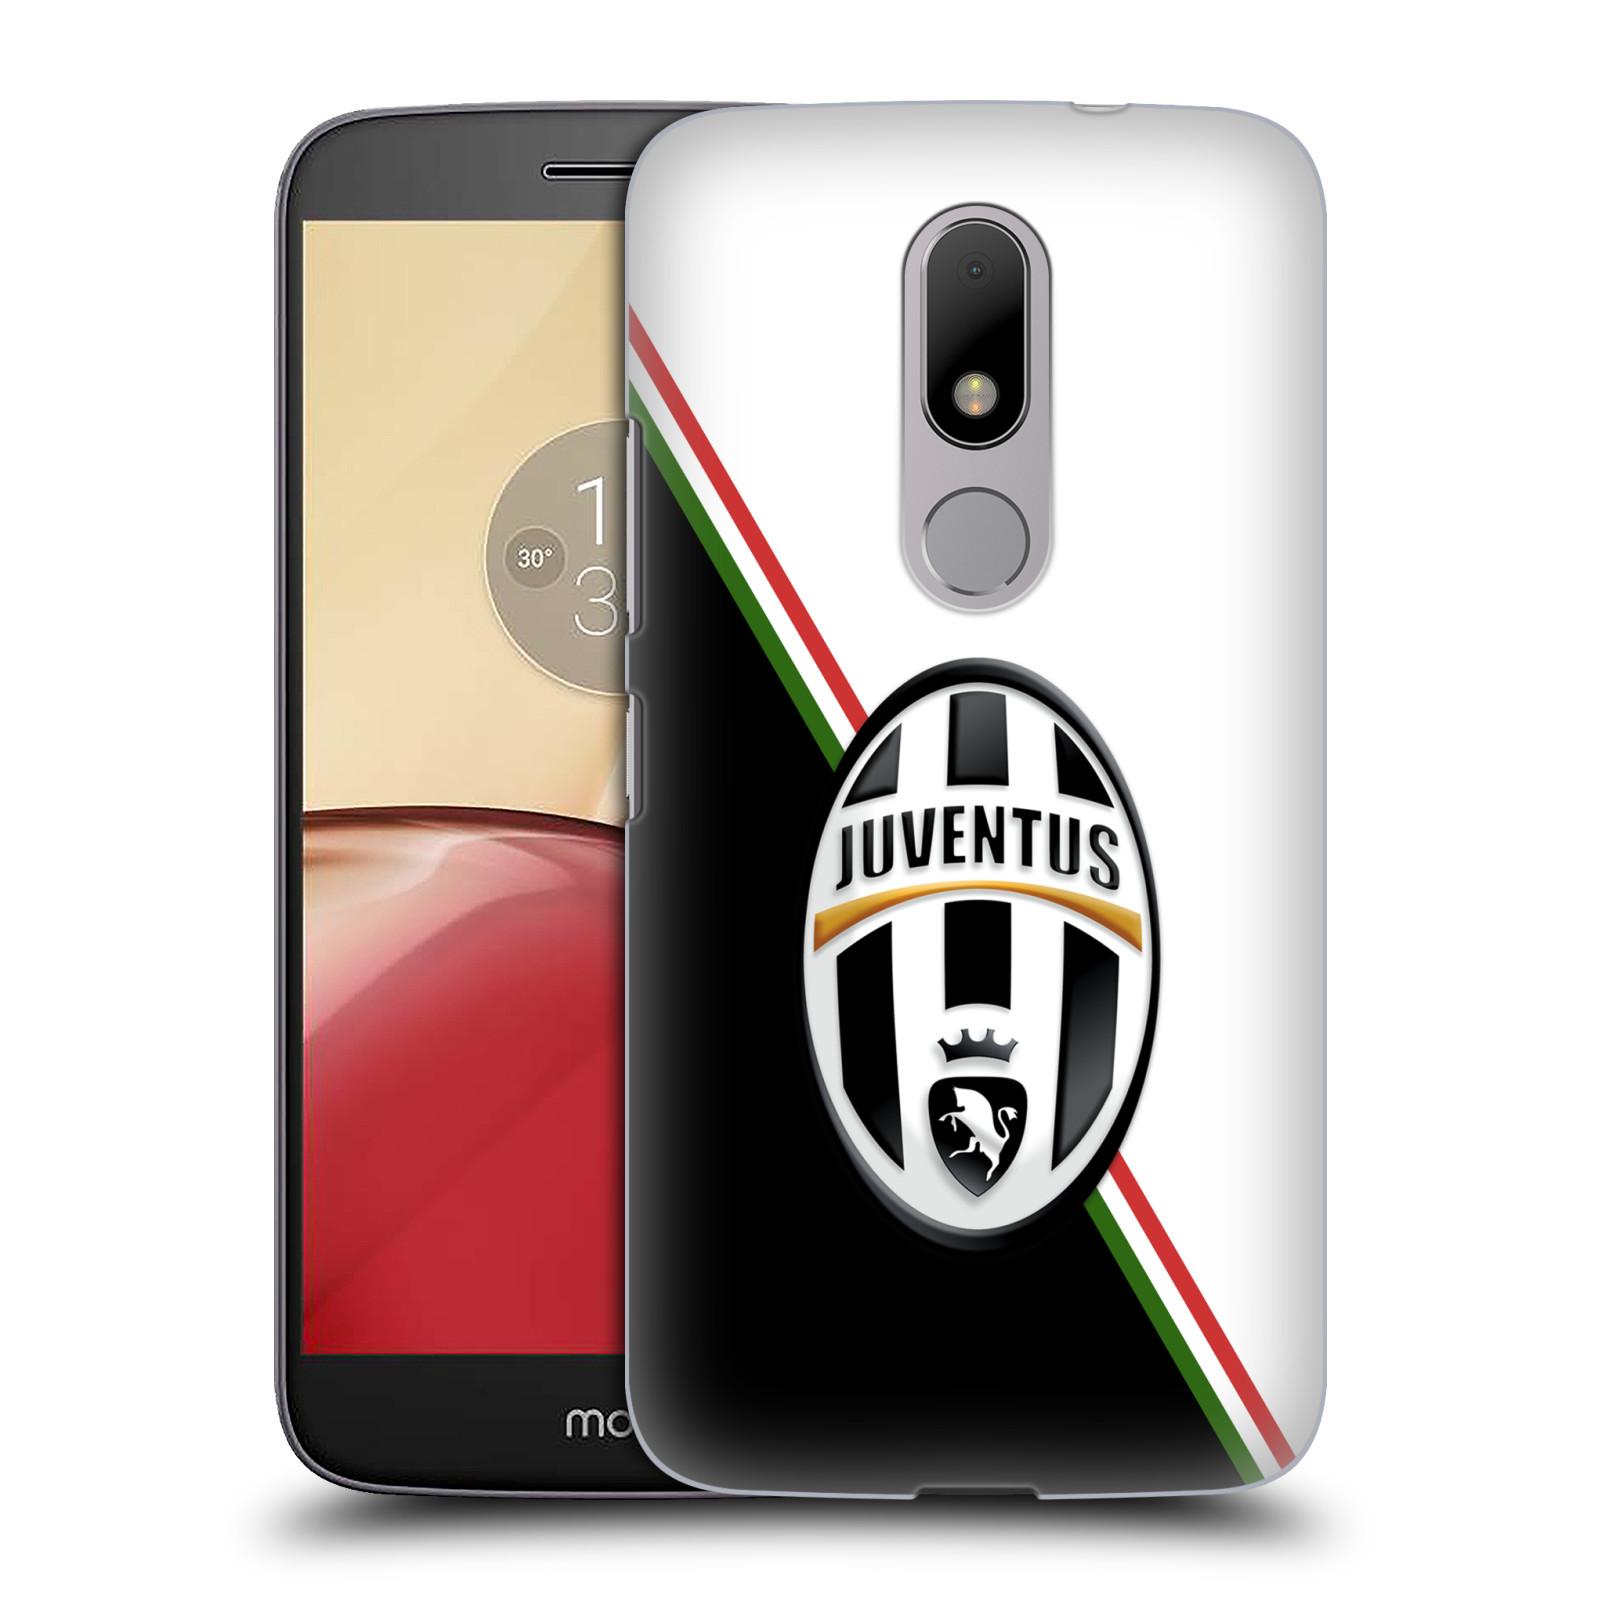 Plastové pouzdro na mobil Lenovo Moto M HEAD CASE Juventus FC - Black and White (Plastový kryt či obal na mobilní telefon Juventus FC Official pro Lenovo (Motorola) Moto M / Moto M Dual SIM)